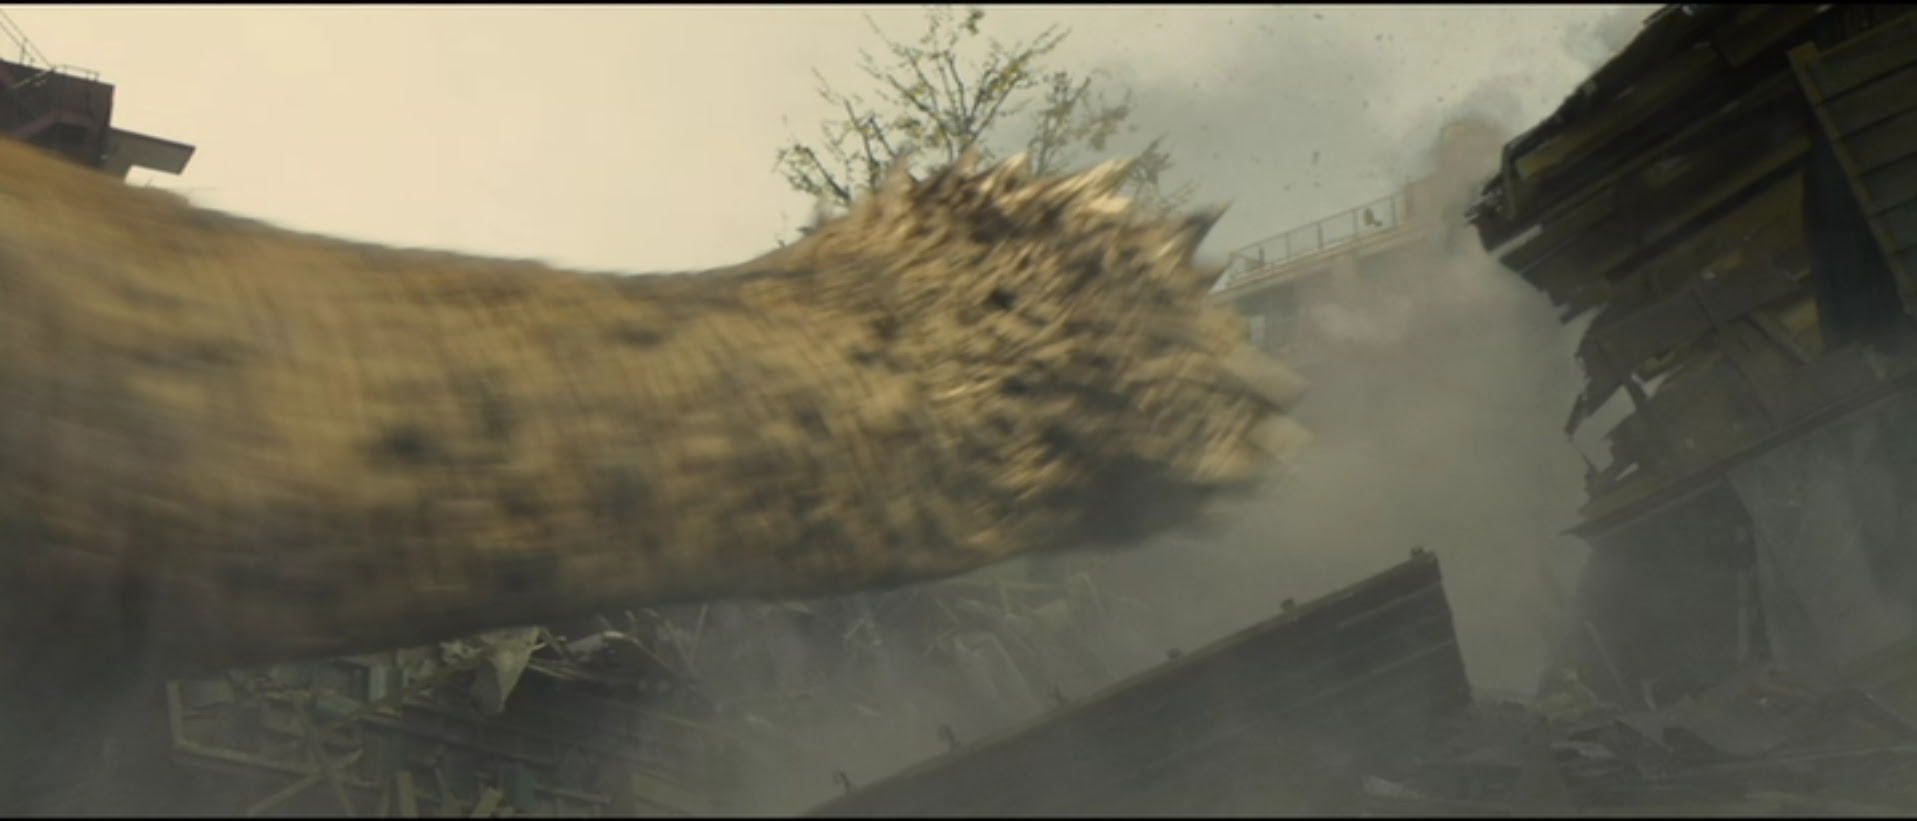 Godzilla's Ghidorah-like tail